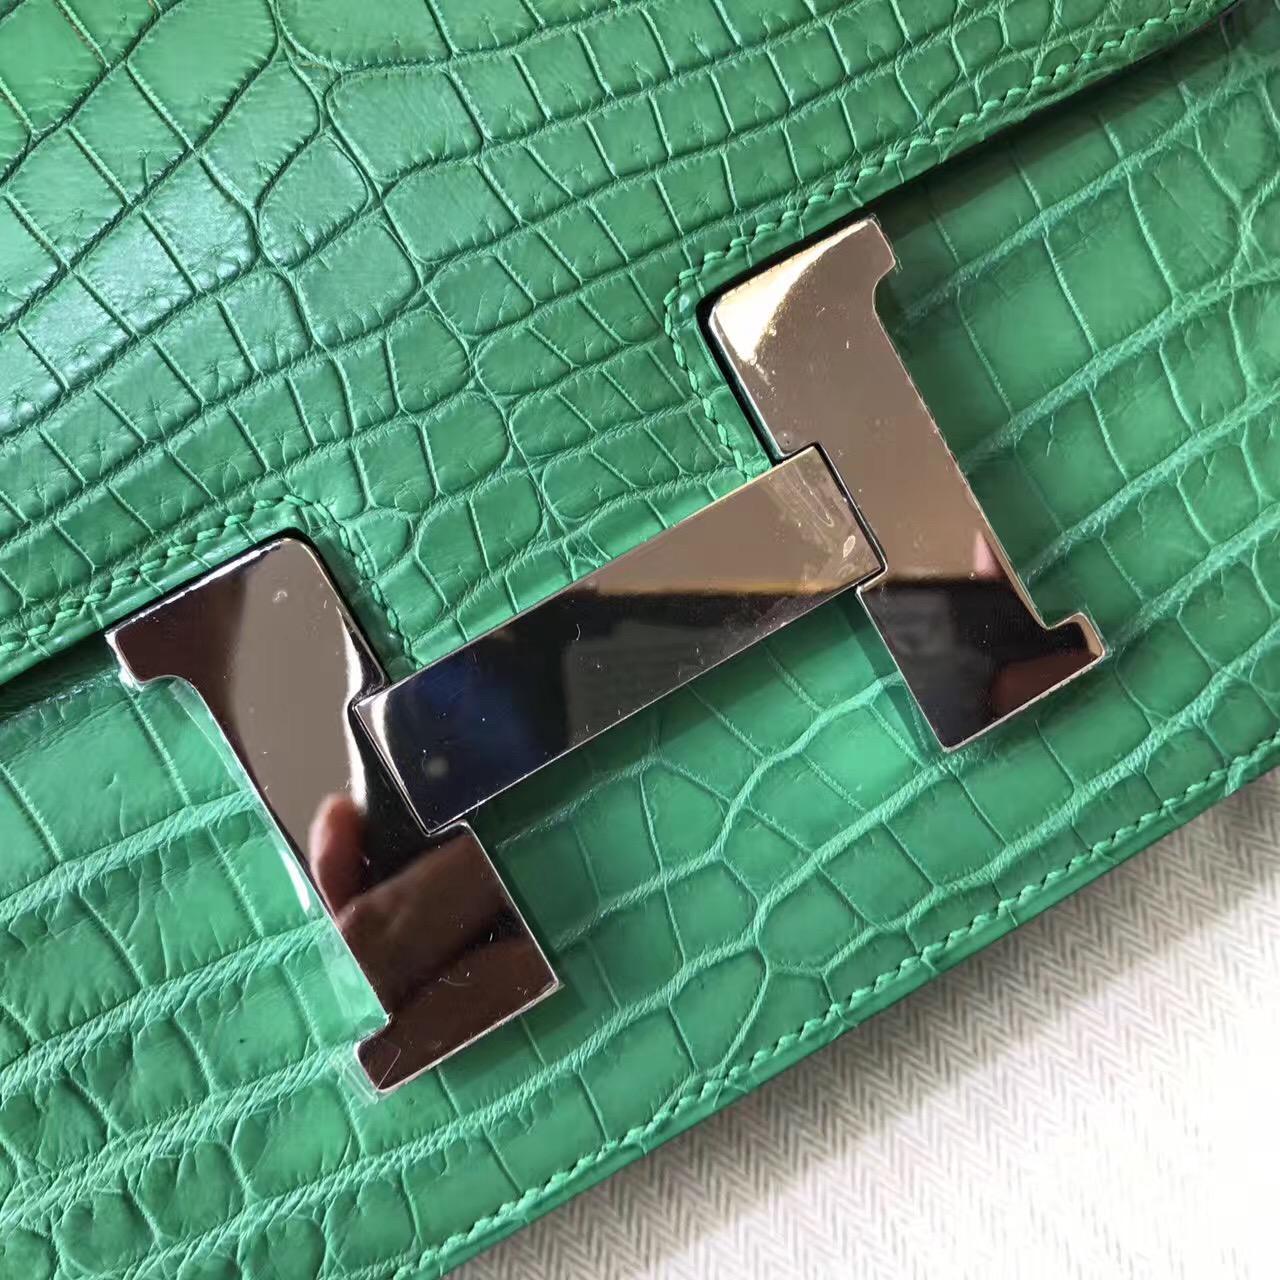 Hermes Constance 23 crocodile leather霧面鱷魚皮革 仙人掌綠色cactus green